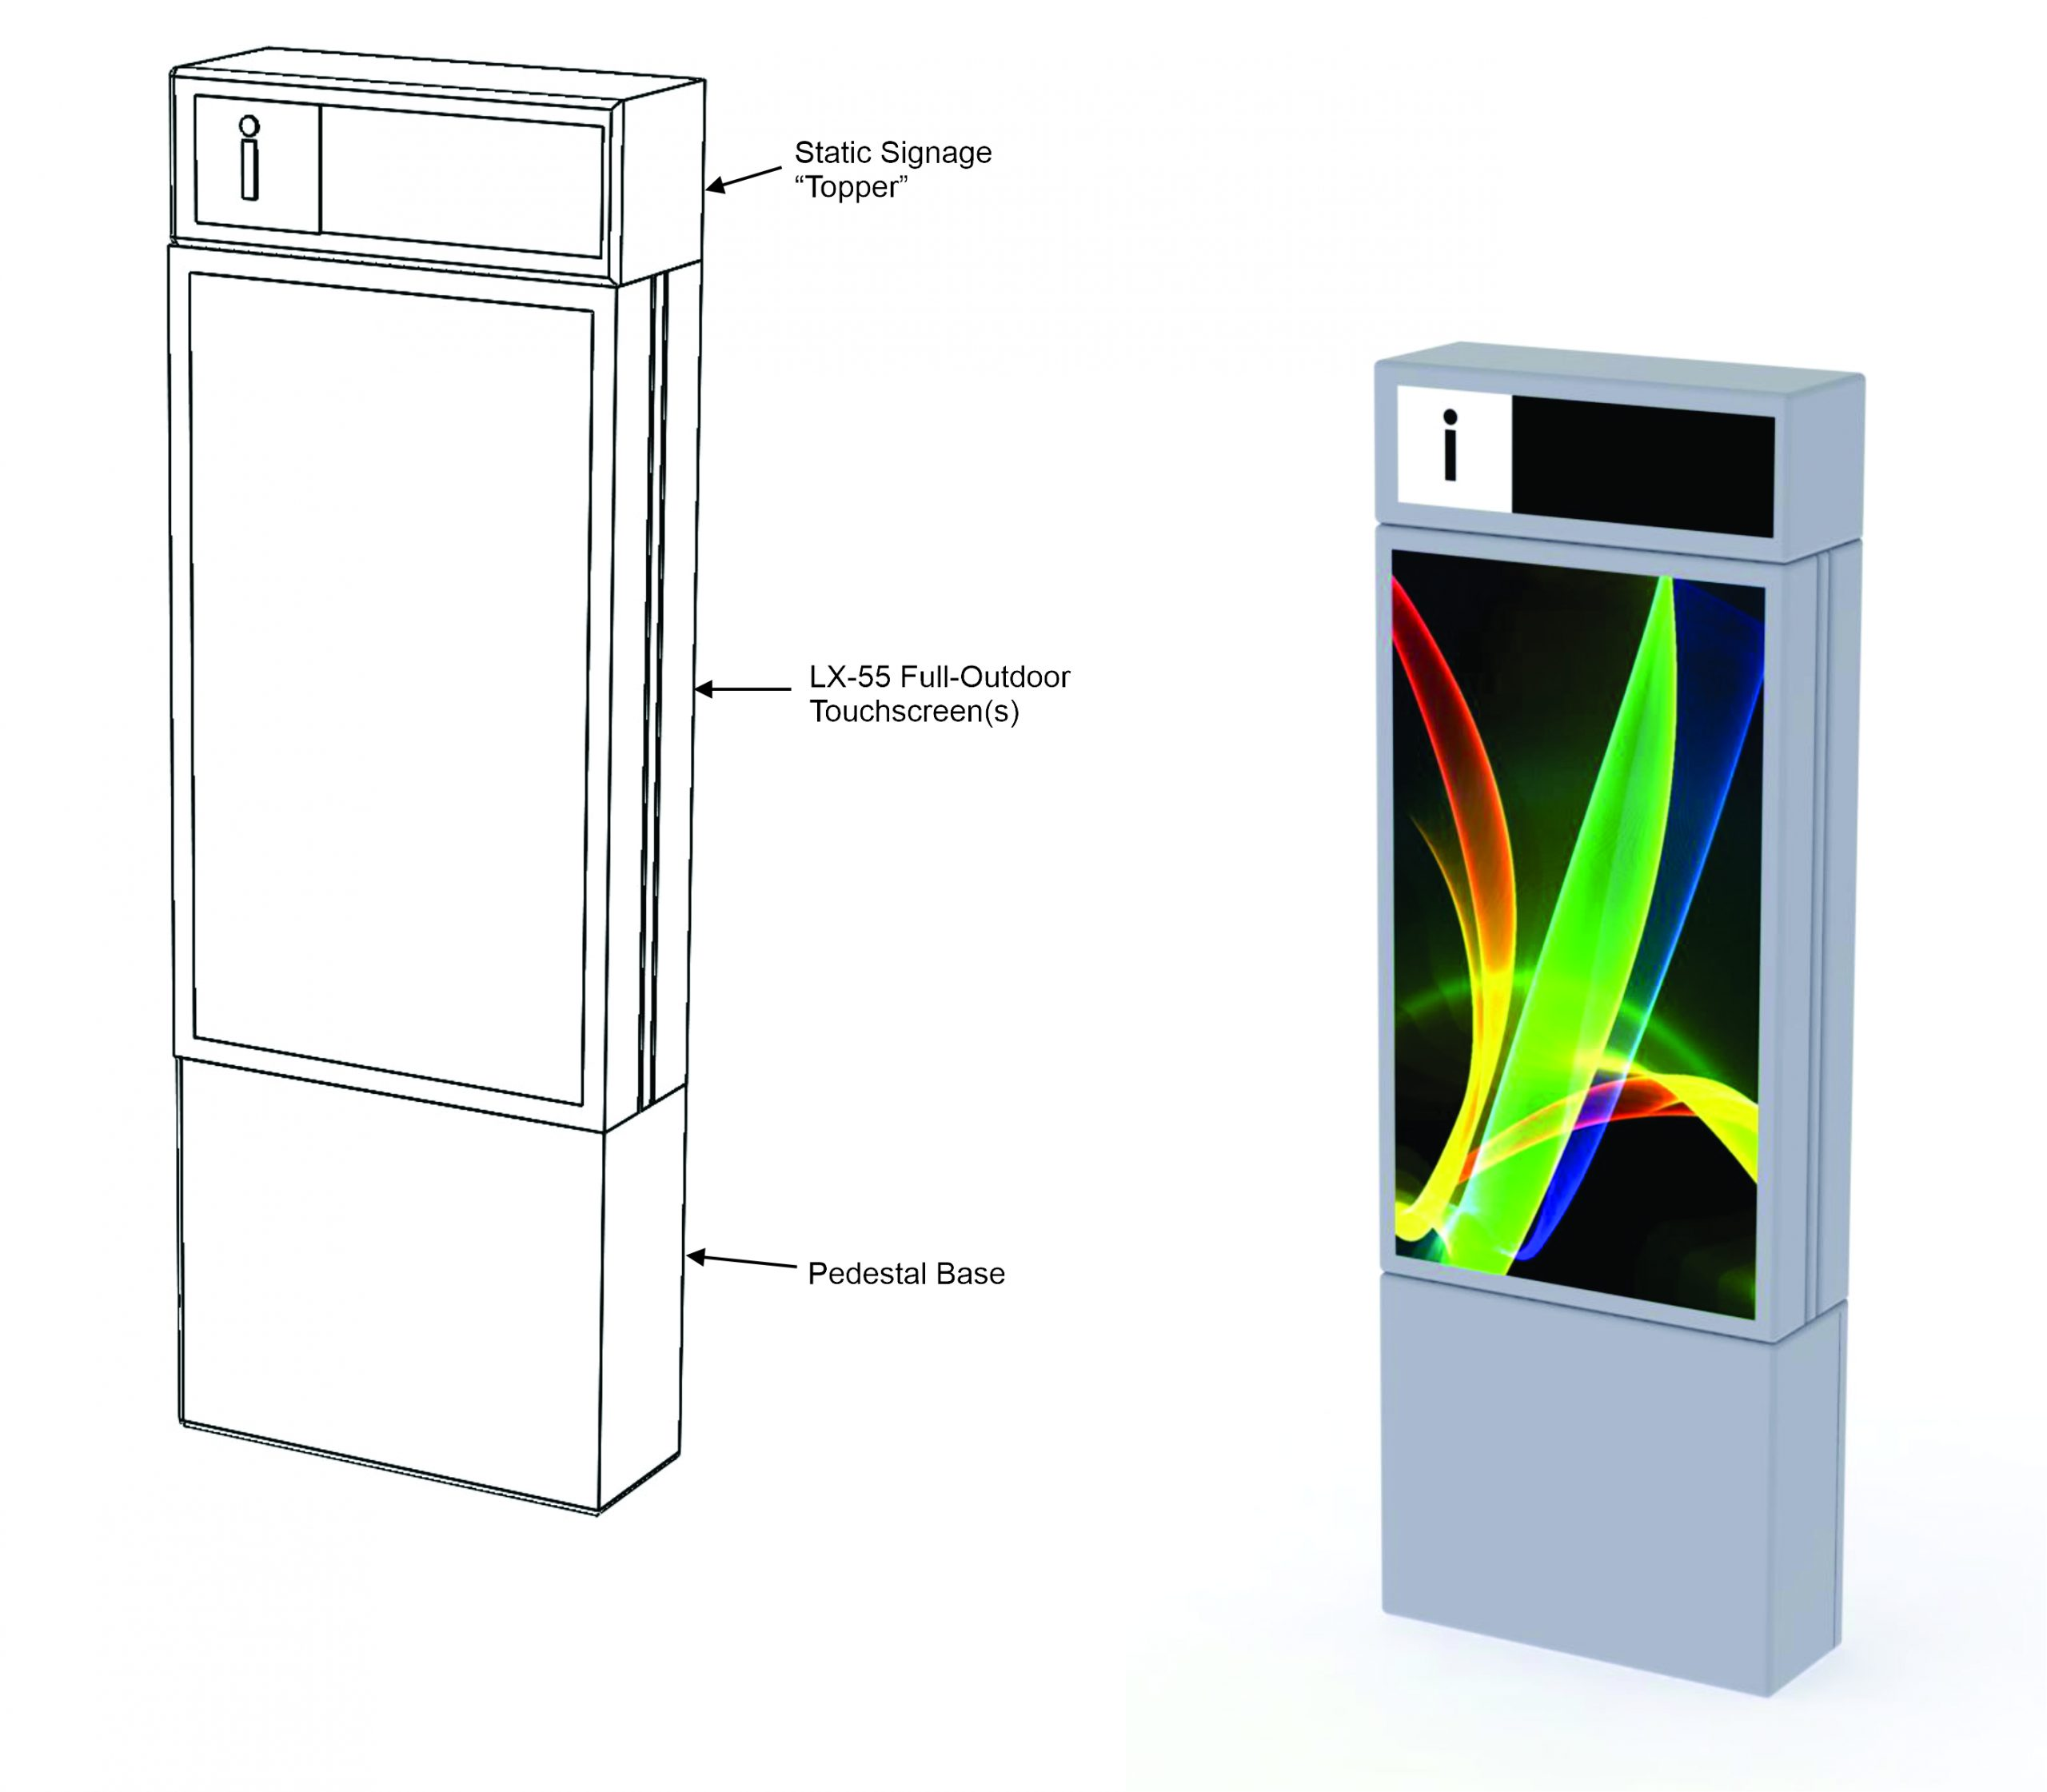 Modular Free-Standing Kiosk System